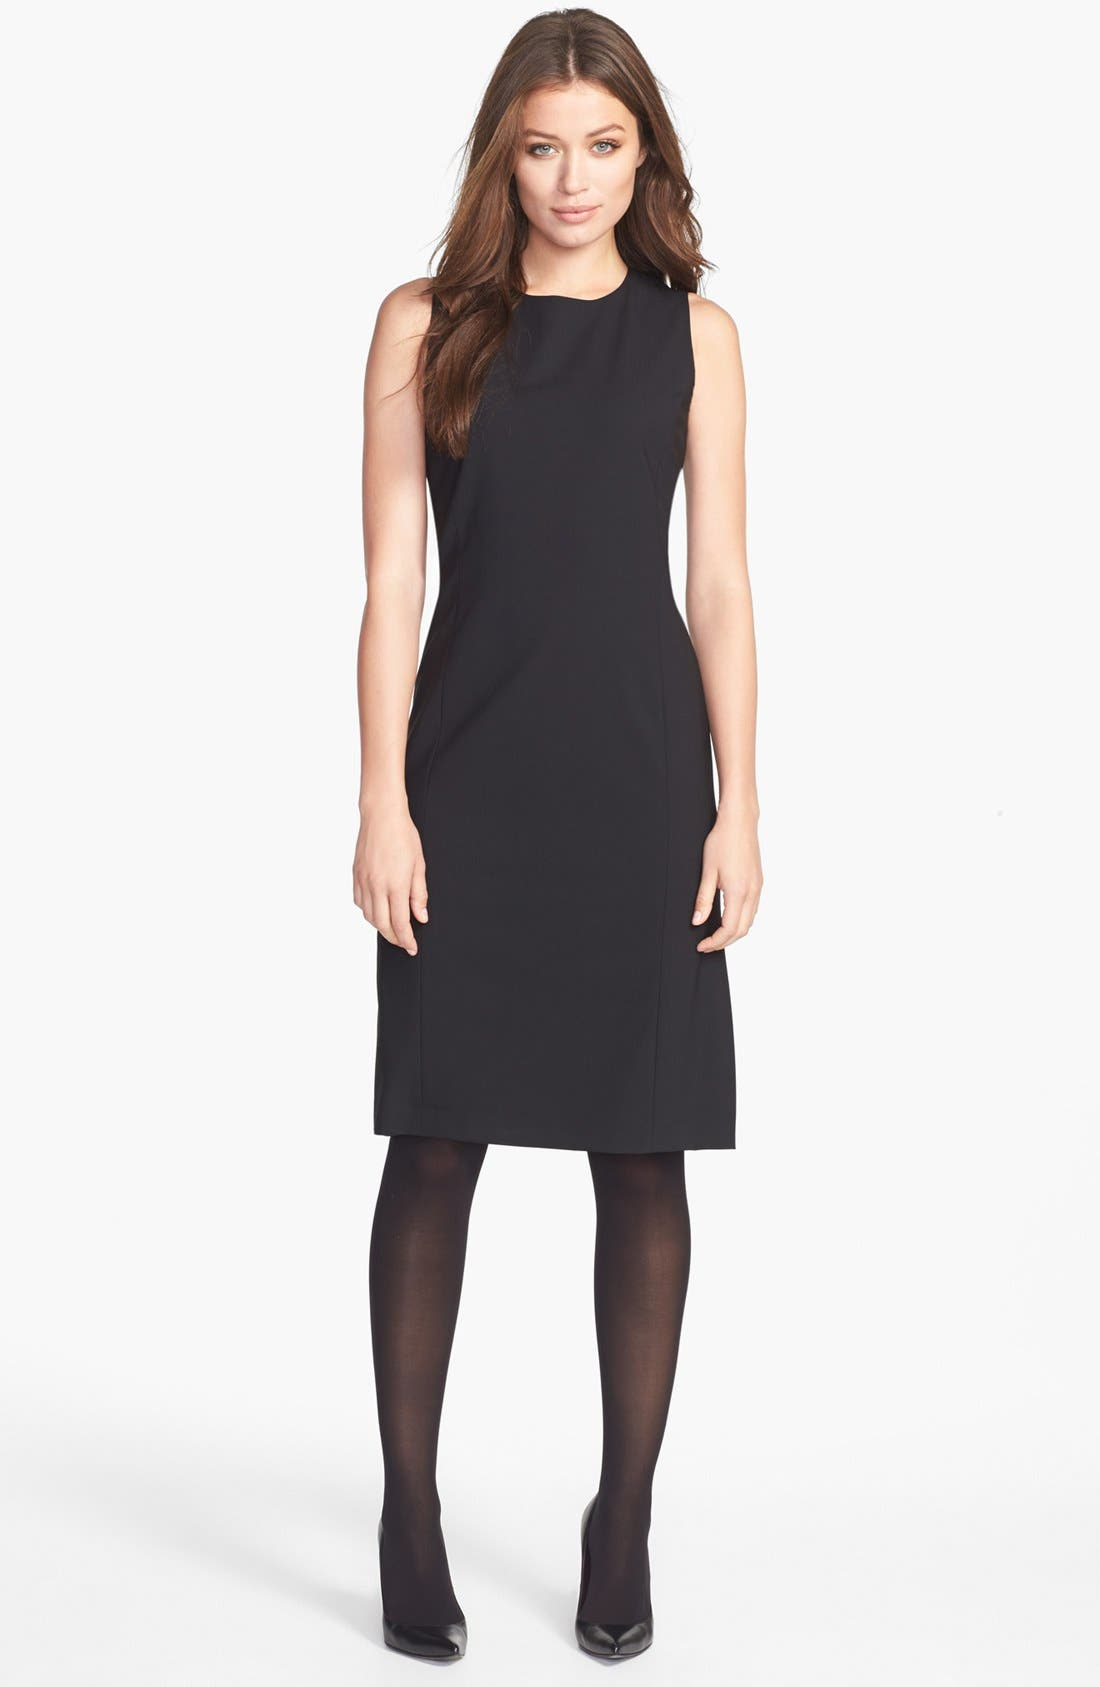 Alternate Image 1 Selected - Lafayette 148 New York Wool Sheath Dress